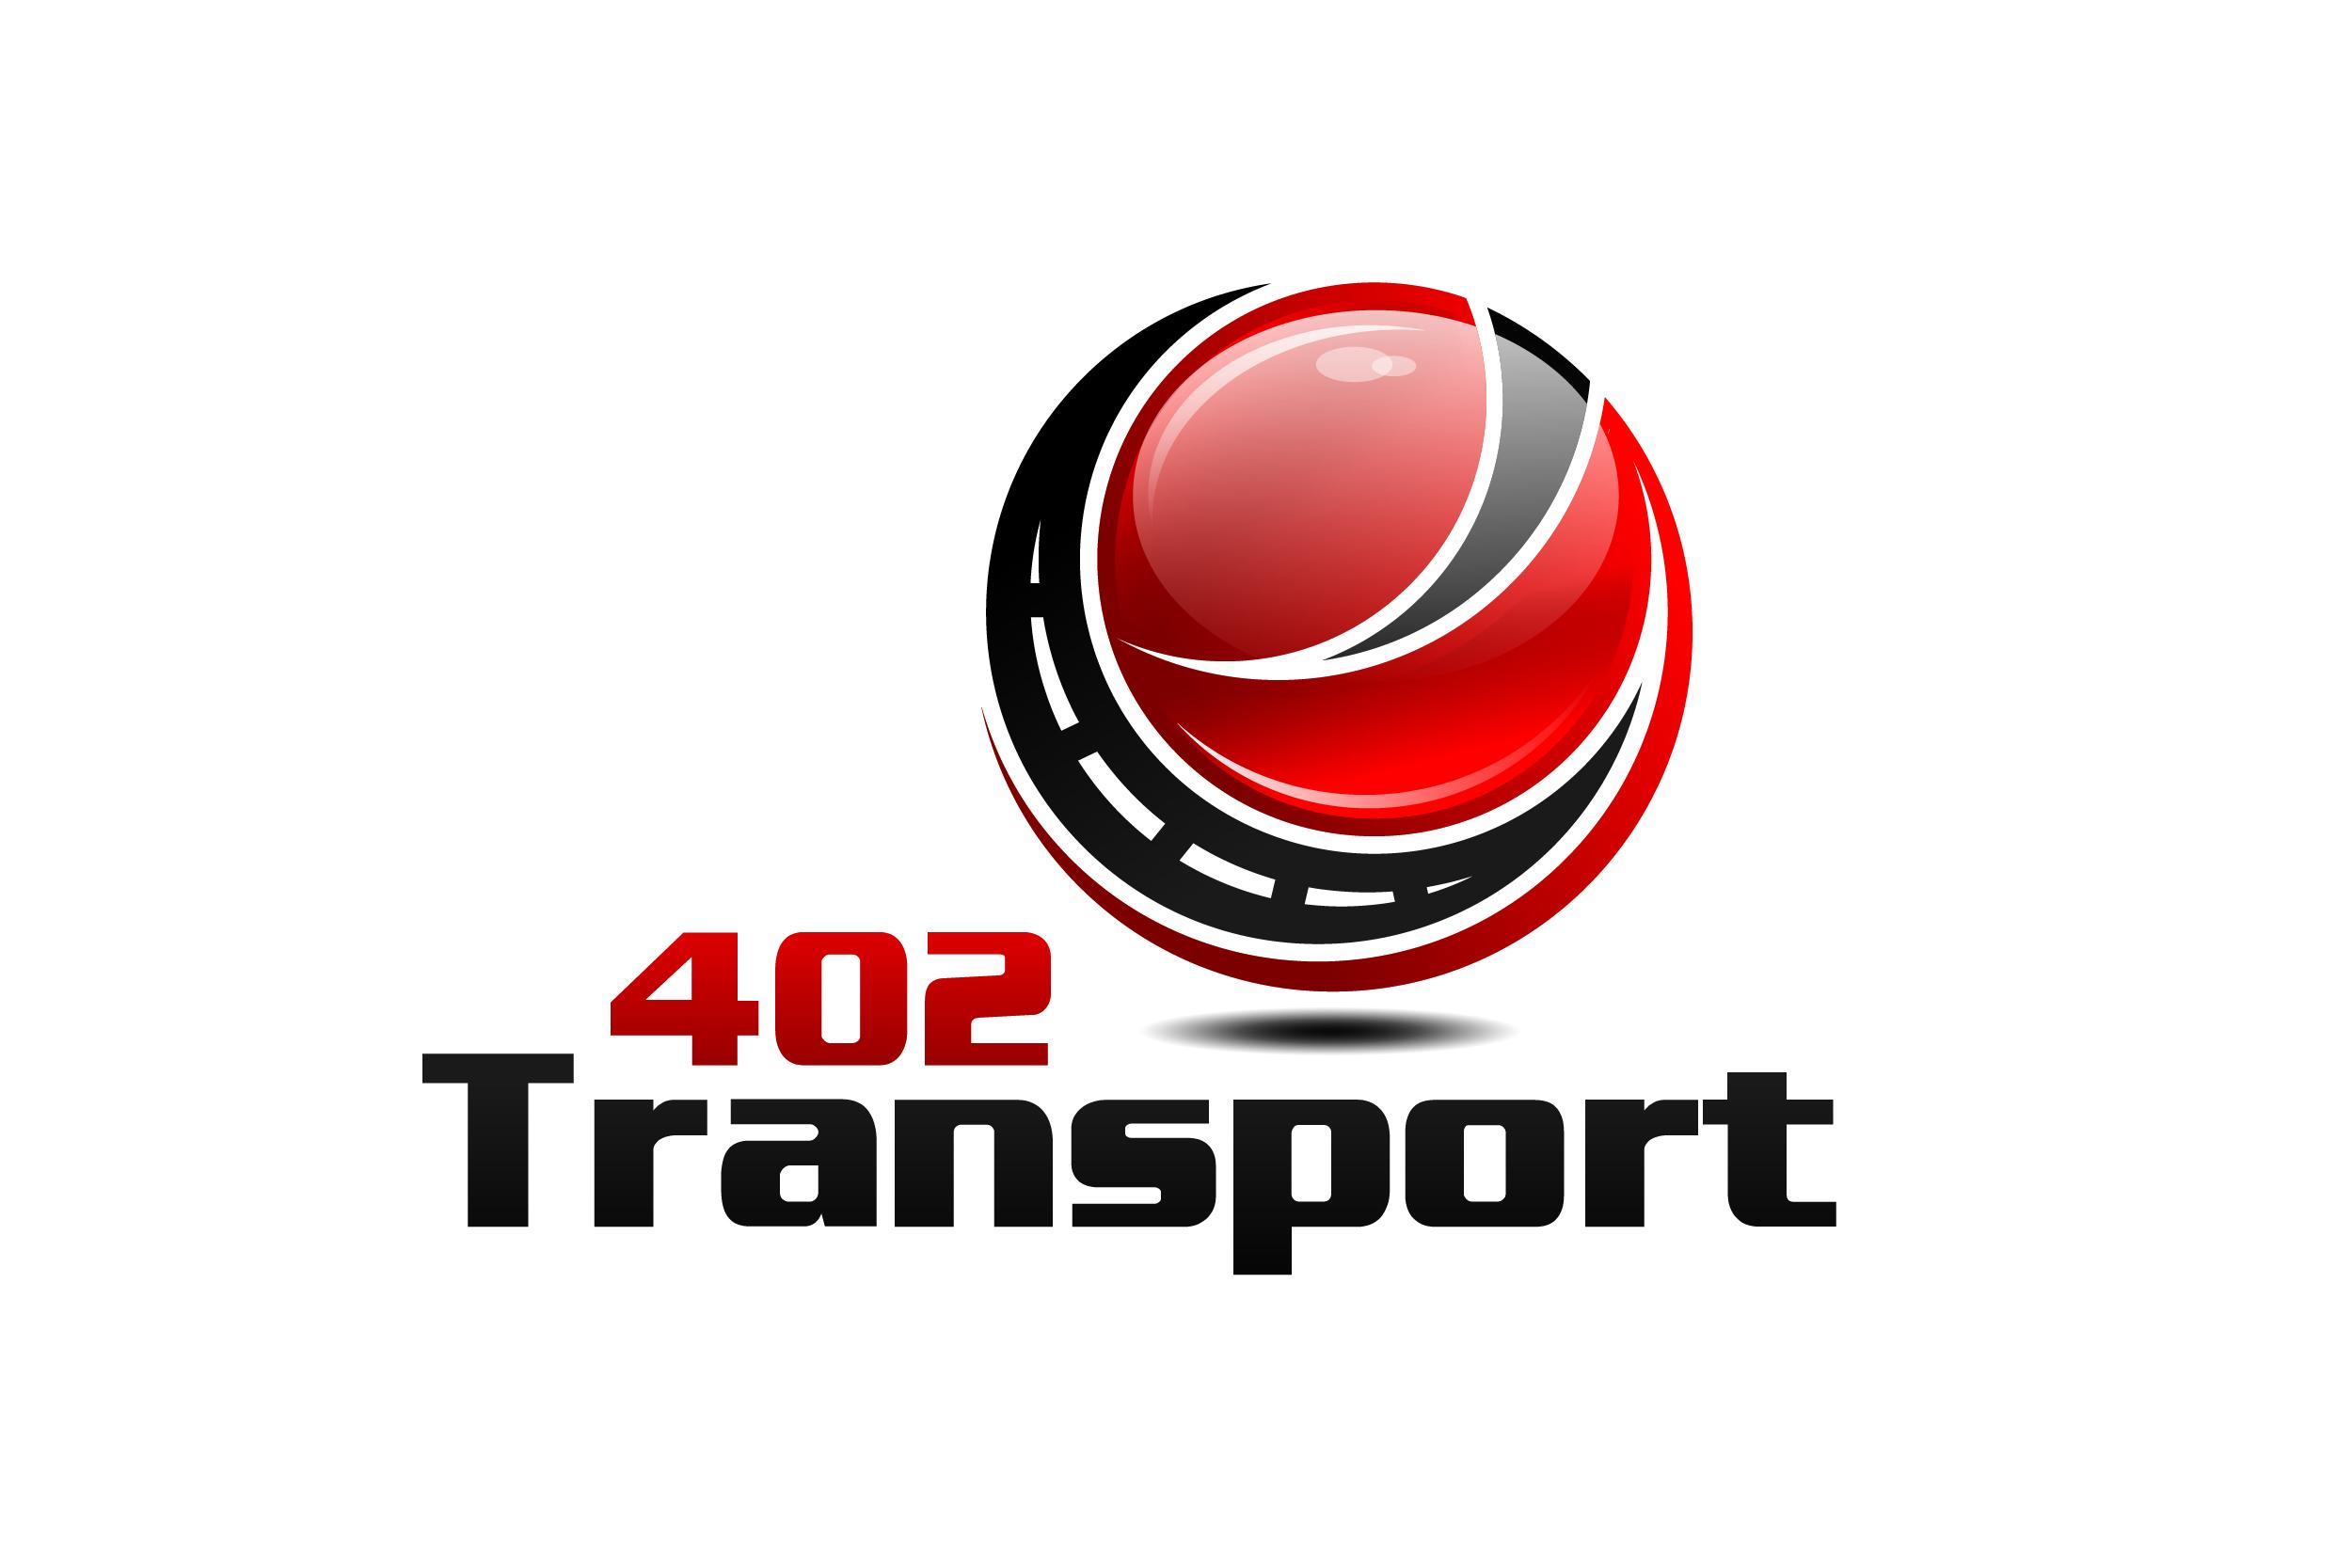 402 Transpor cnyk-01.jpg